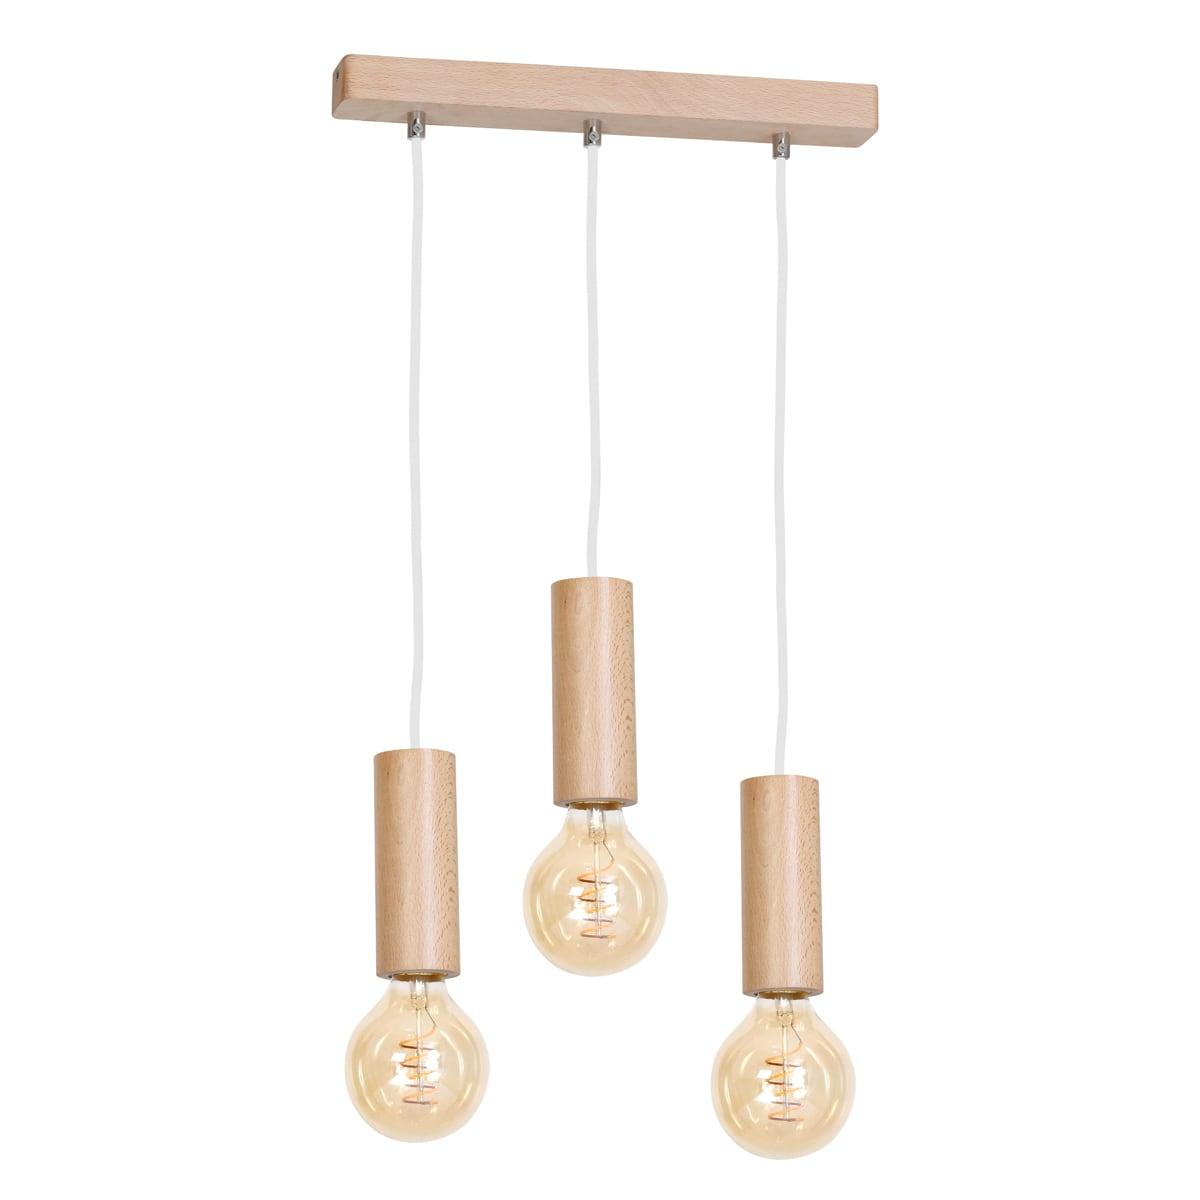 Lampa suspendată Milagro BOSCO 613 Lemn natural 3xE27 40W